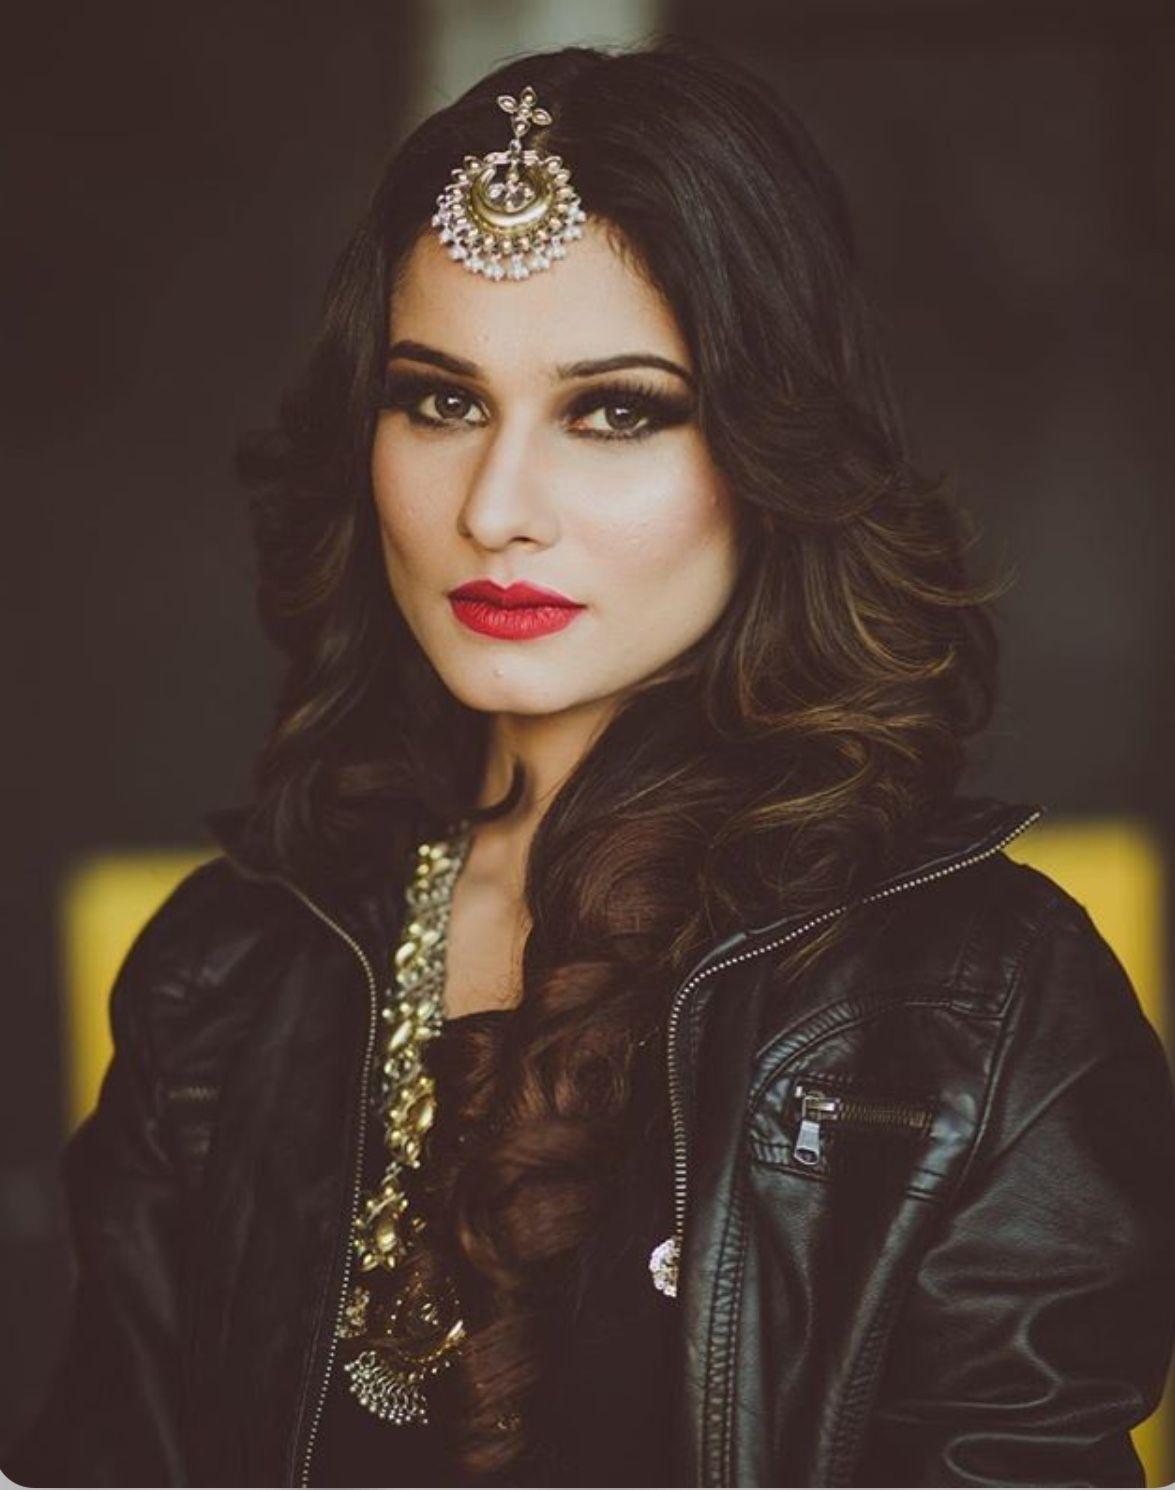 Pin by Sana:) on TV stars | Crown jewelry, Beautiful, Jewelry